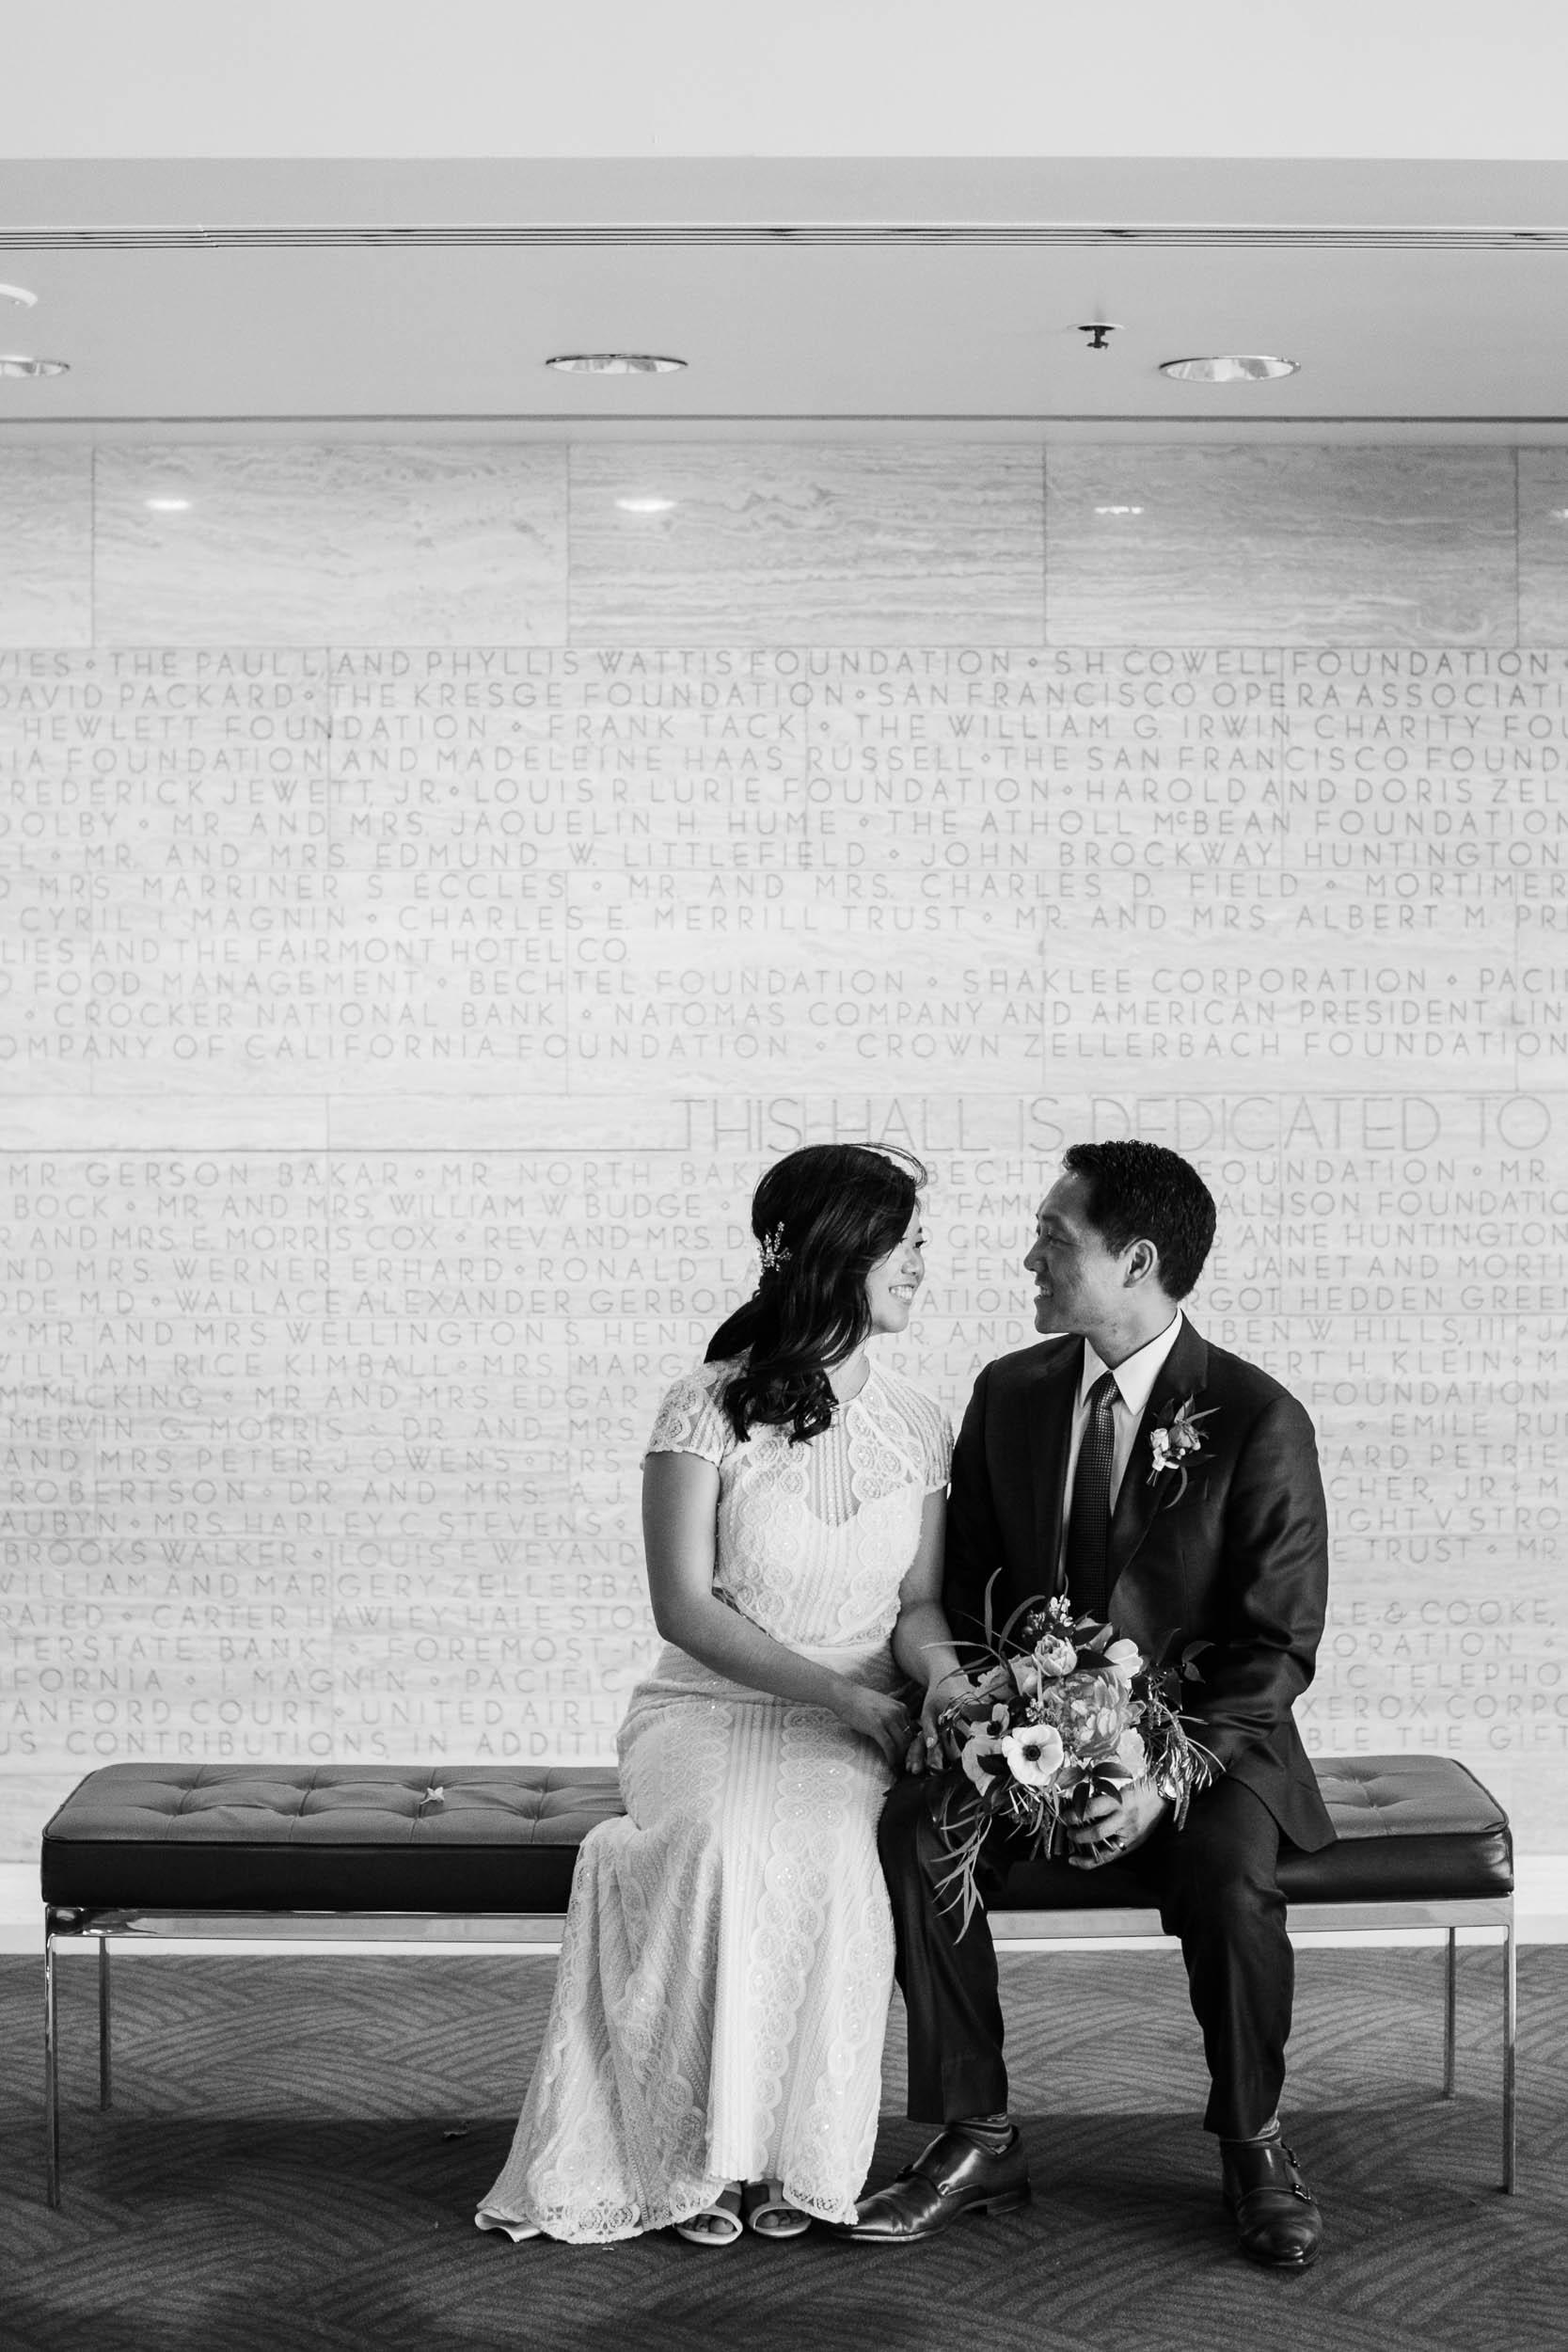 032118_M+D City Hall Wedding_Buena Lane Photography_1074.jpg